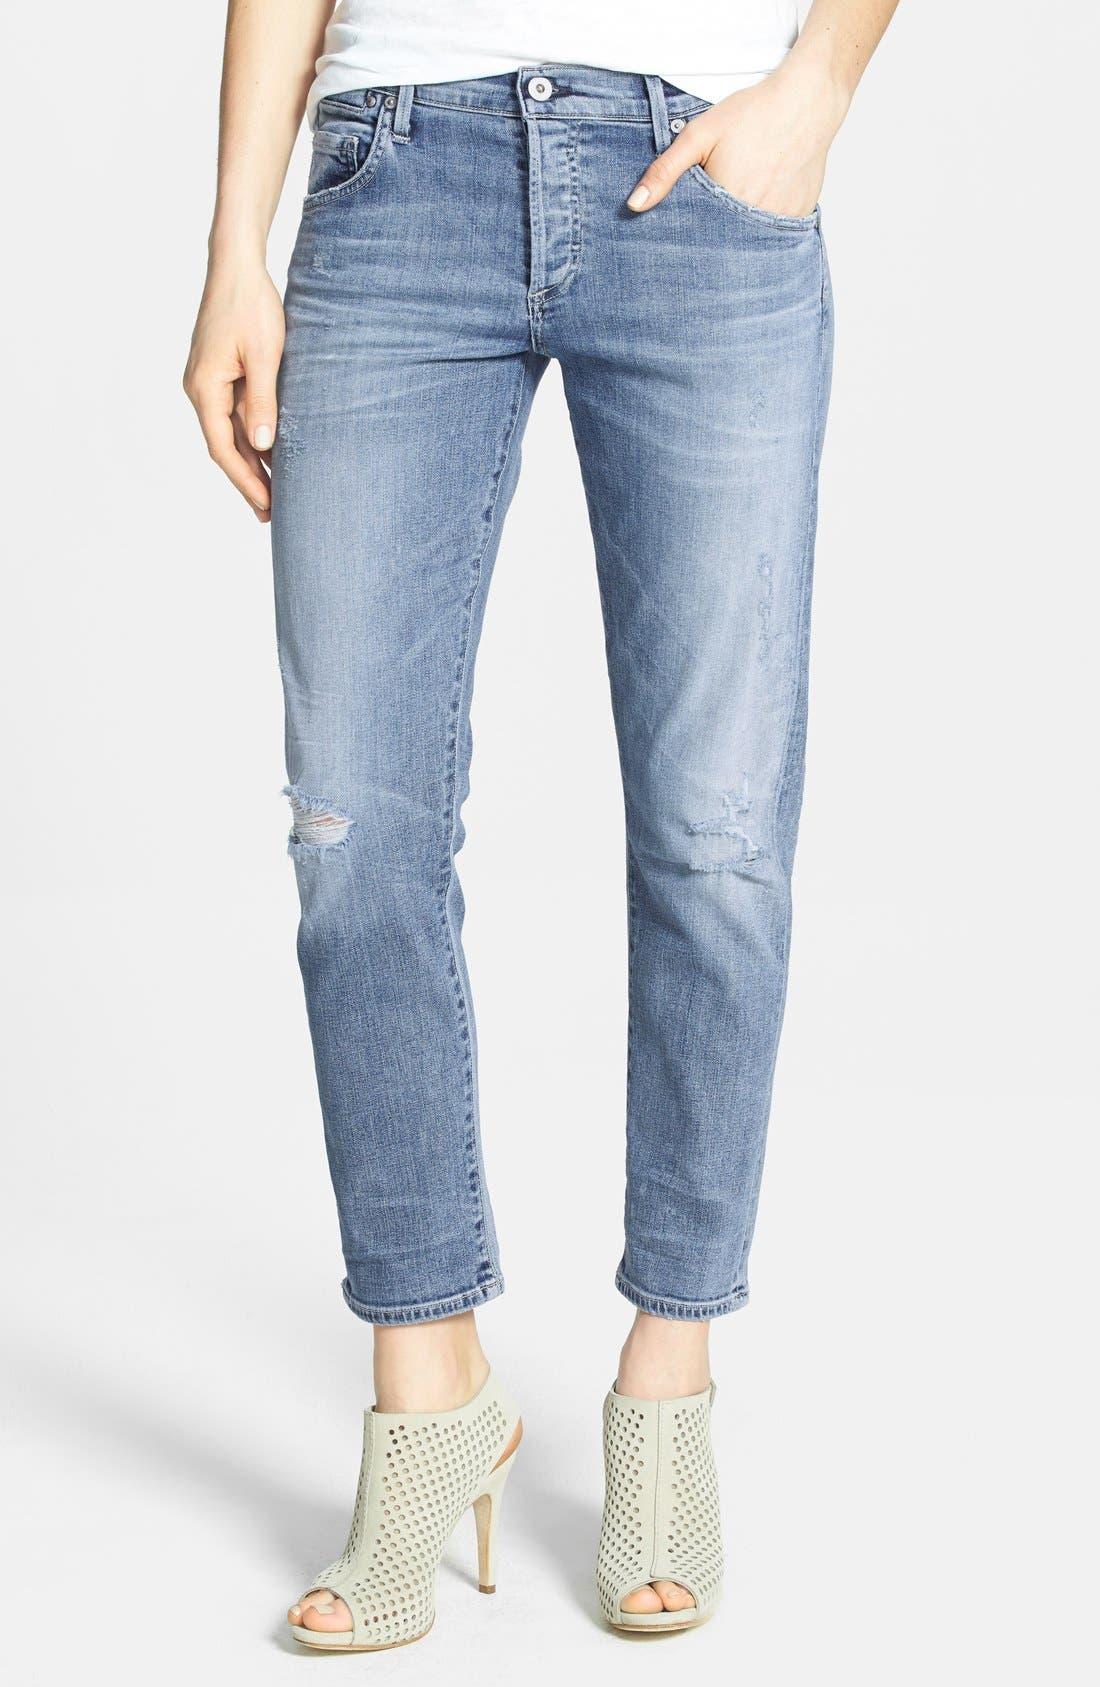 Main Image - Citizens of Humanity 'Premium Vintage - Emerson' Slim Boyfriend Crop Jeans (Crosby)